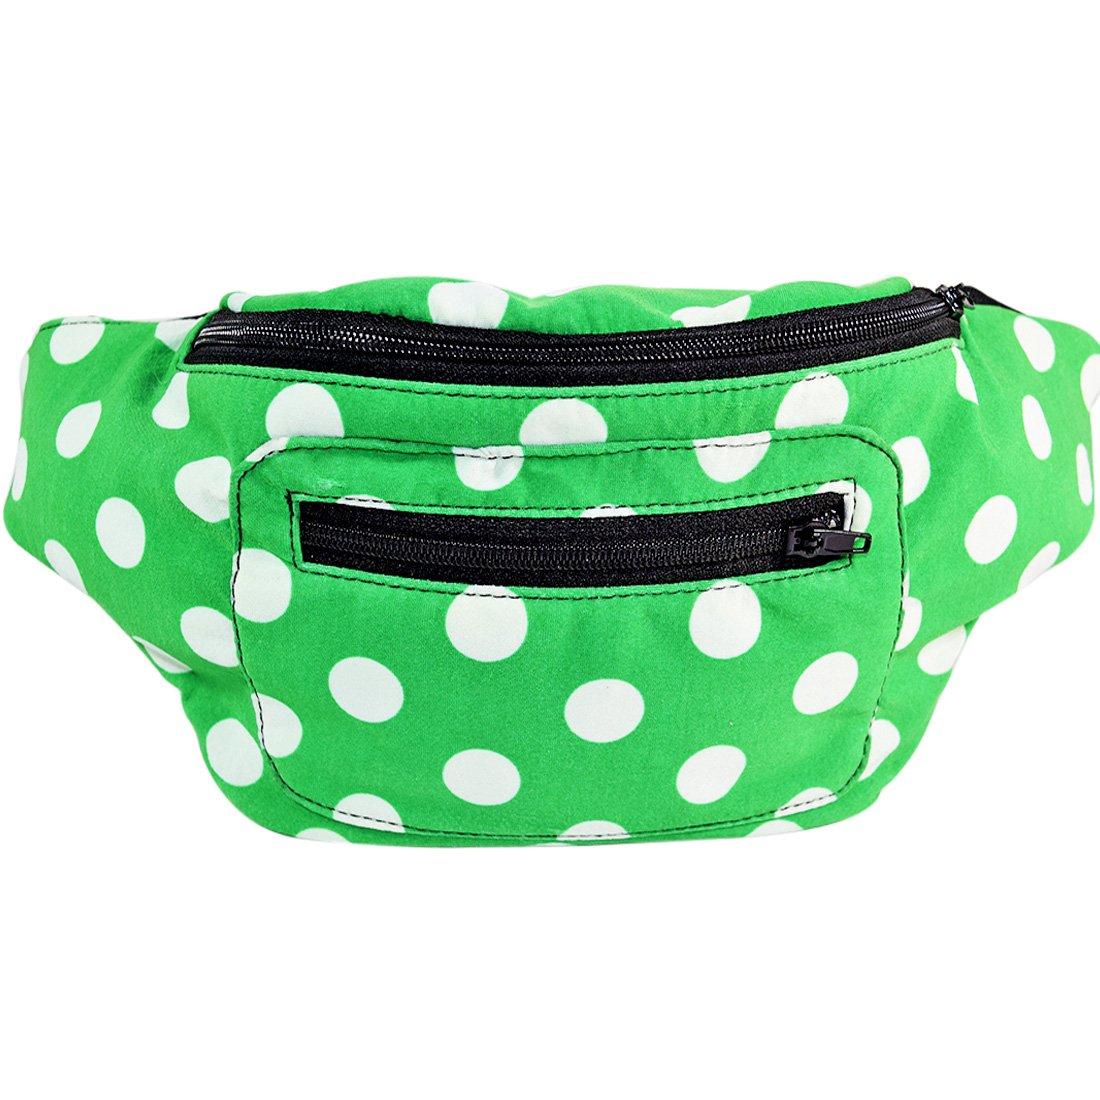 Polka Dot Fanny Pack, Hidden Pocket, Party, Boho Chic & Handmade (Polka Dot Green)